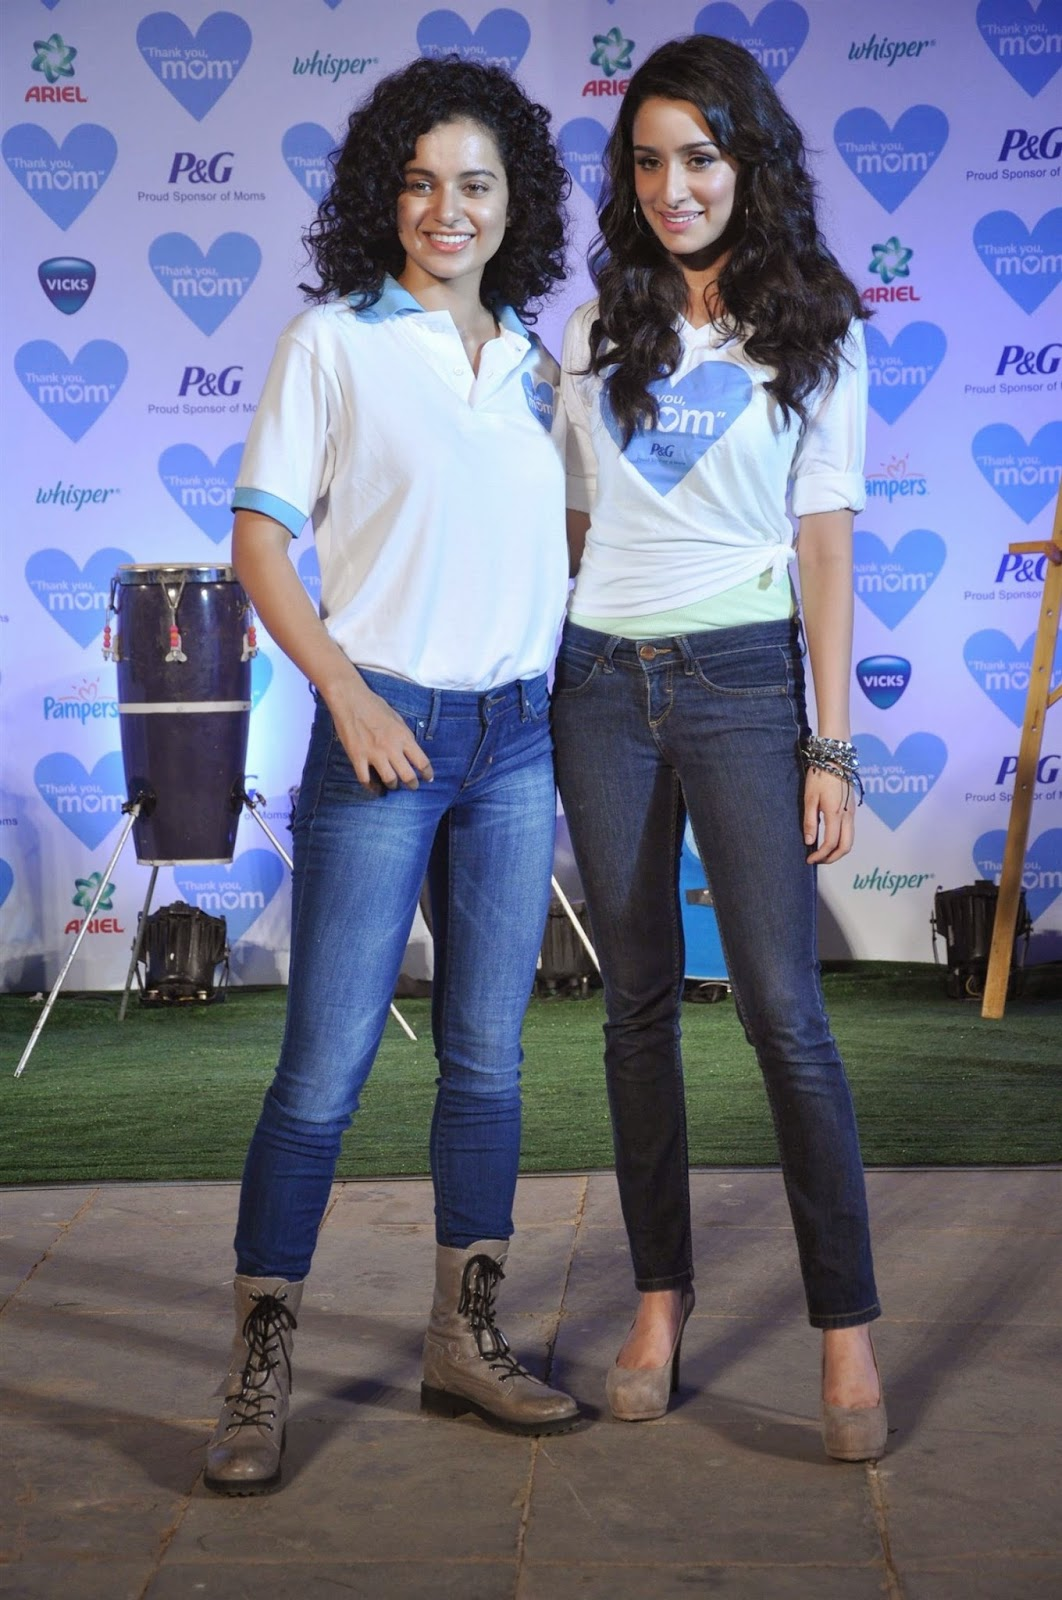 Kangana Ranaut & Shraddha Kapoor hq